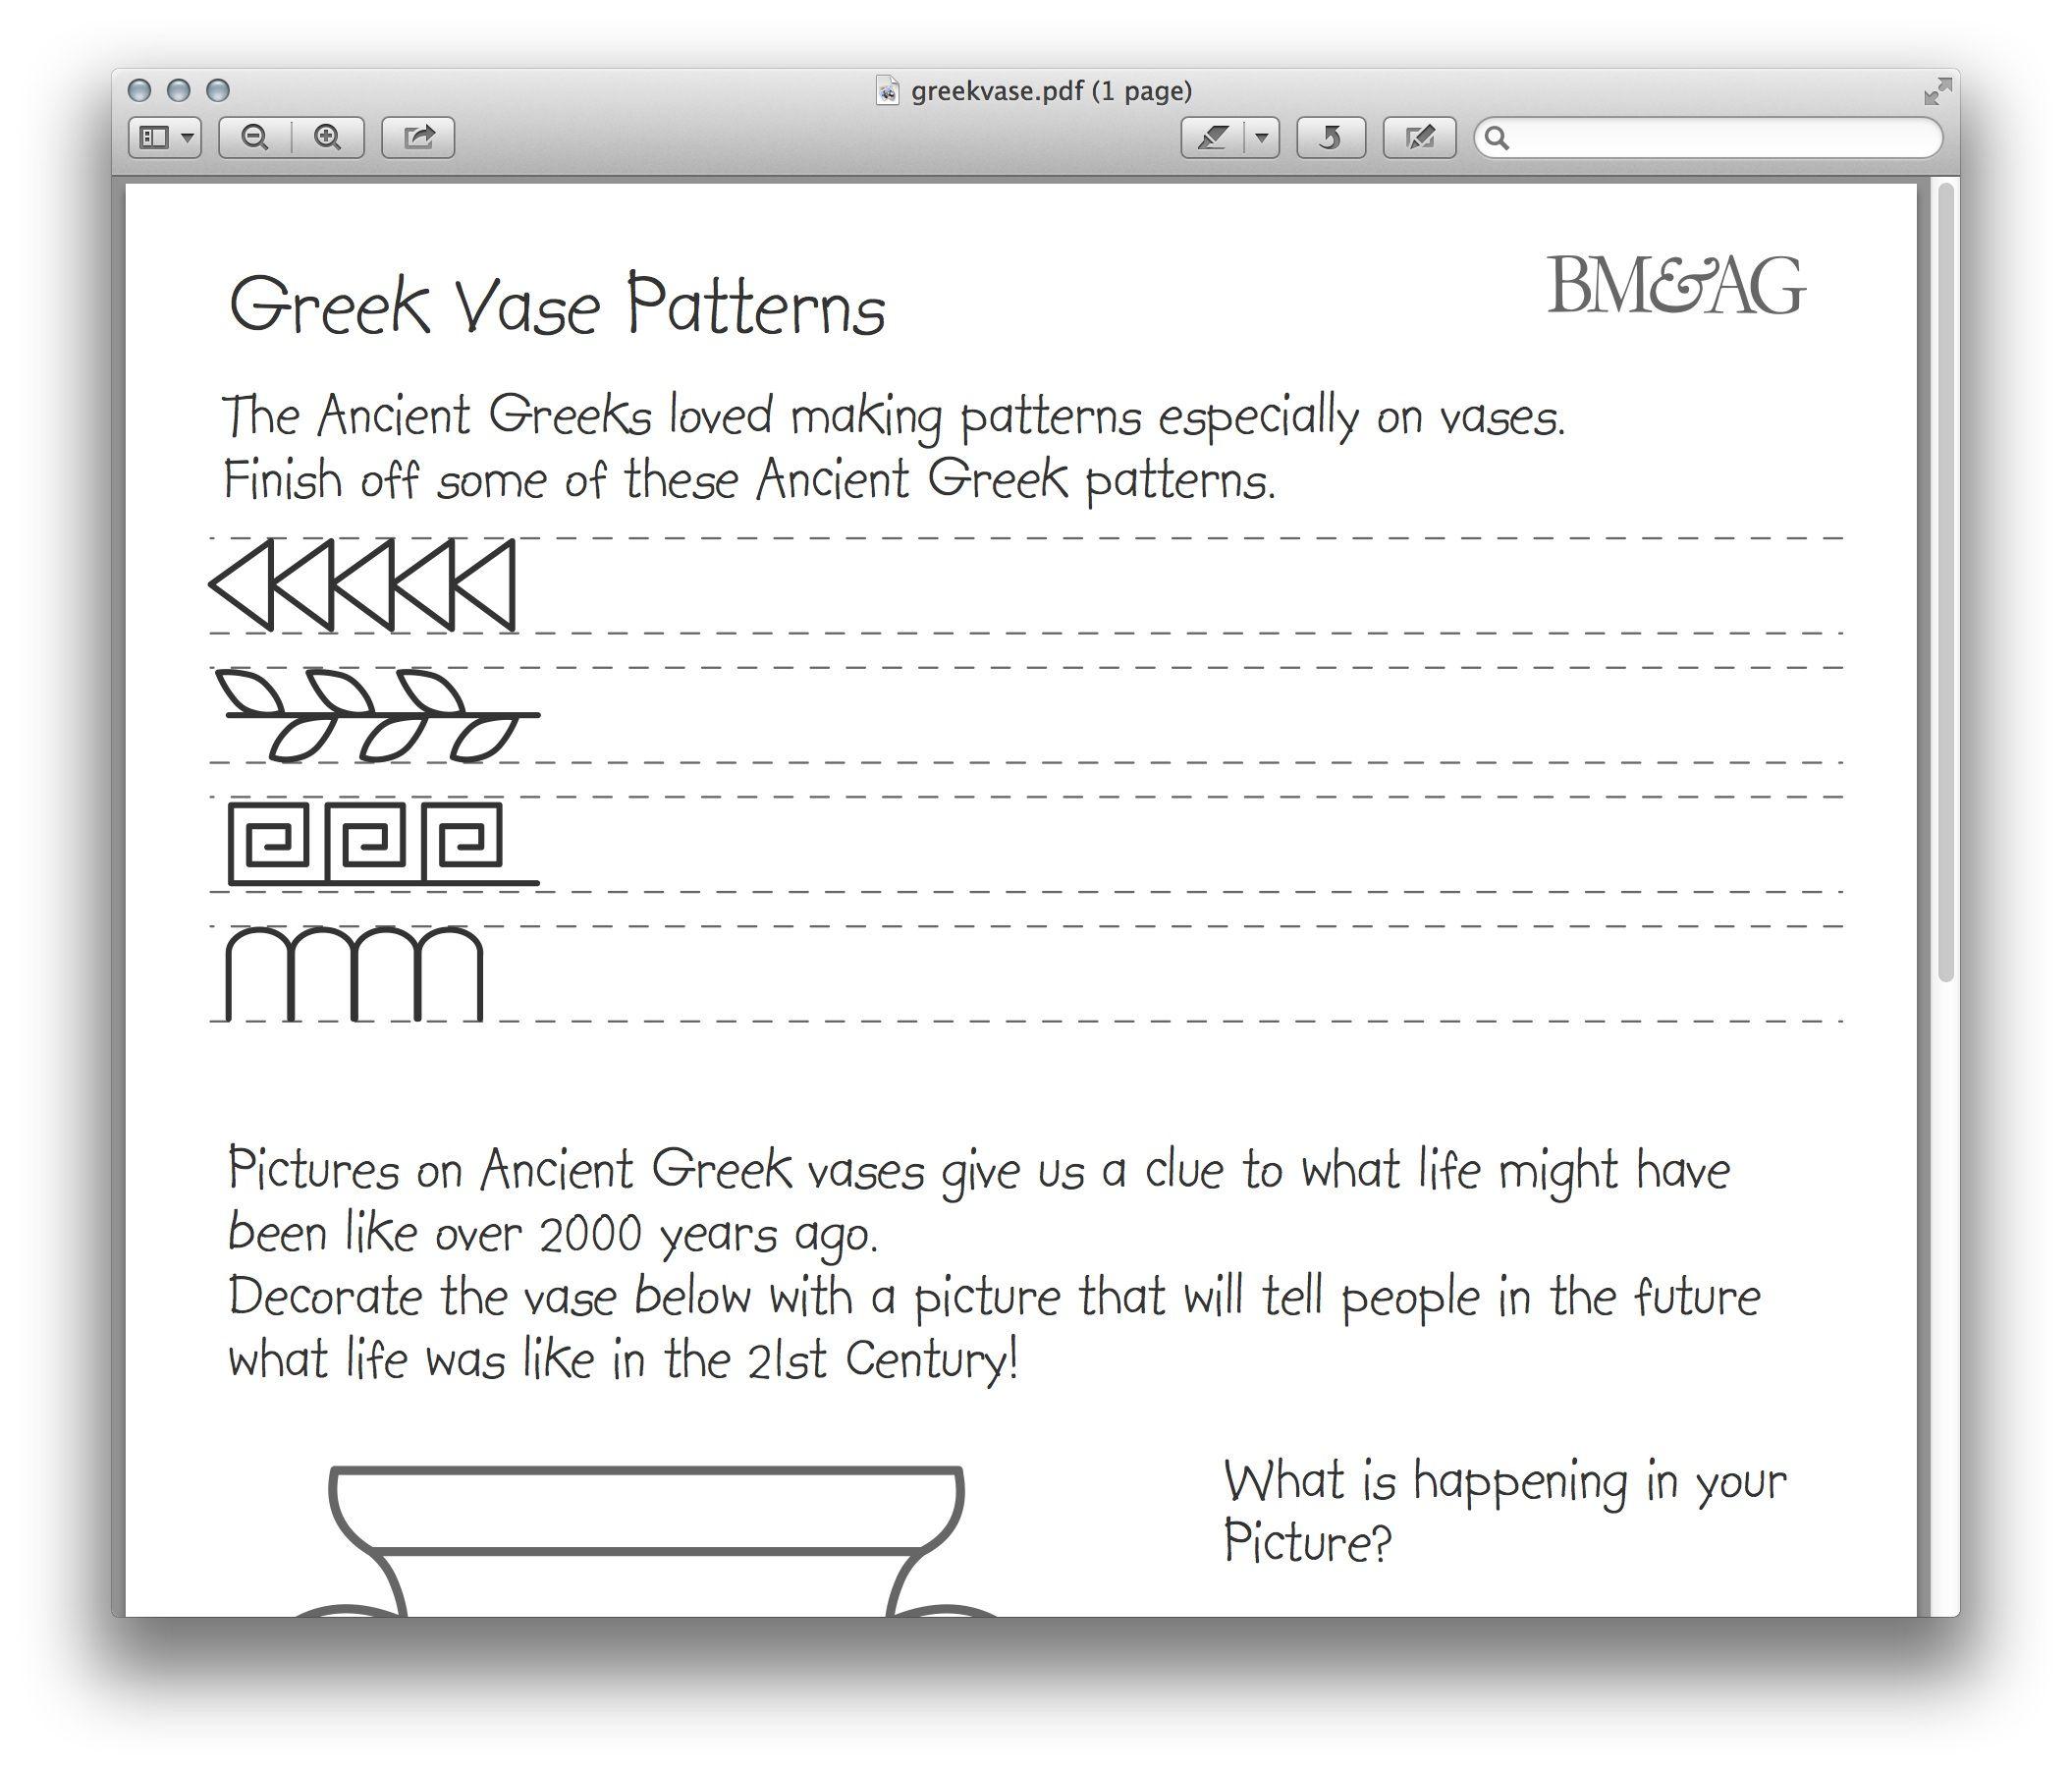 Greek Pottery Nd P Tterns W Ksheet Mystery Of Hist Y Volume 1